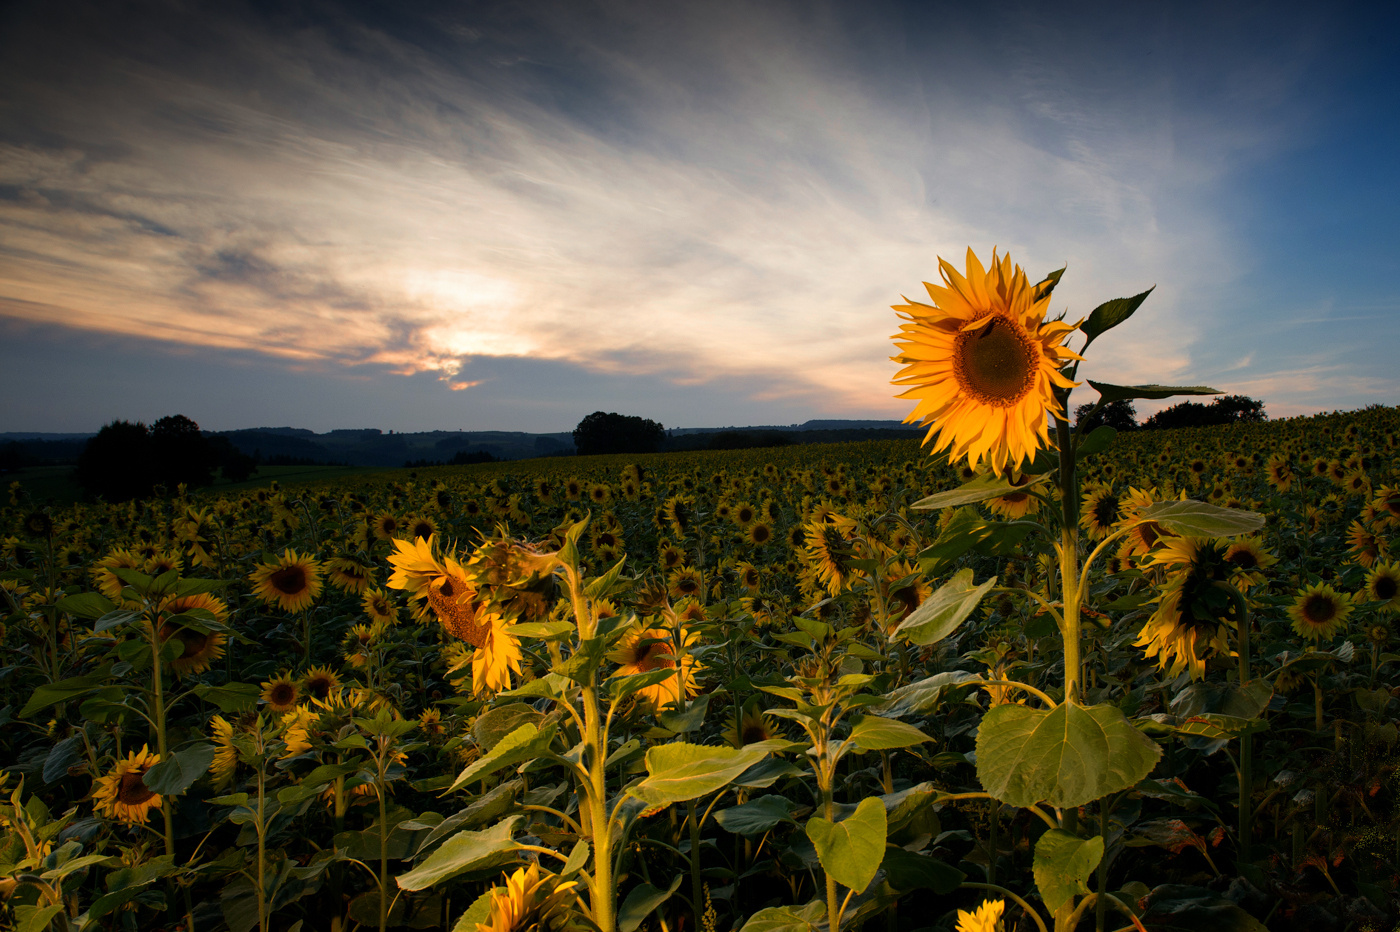 Sonnenblume1